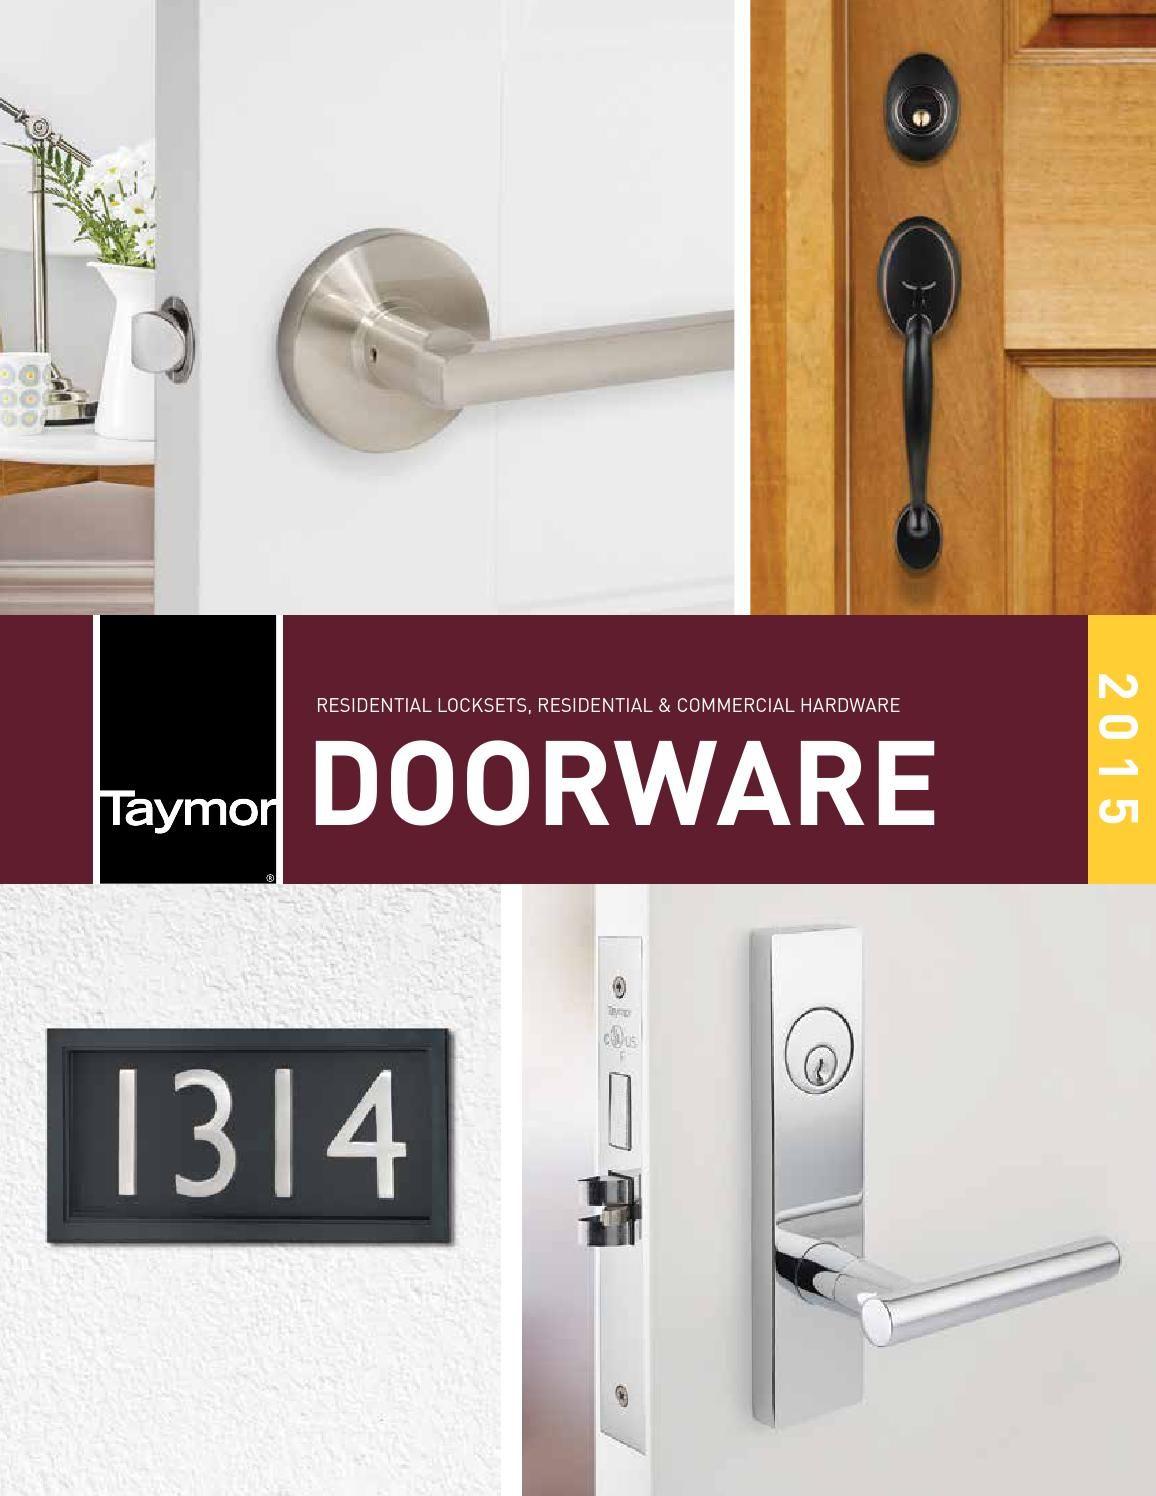 Taymor Usa 2015 Doorware Catalog With Images Catalog Bathroom